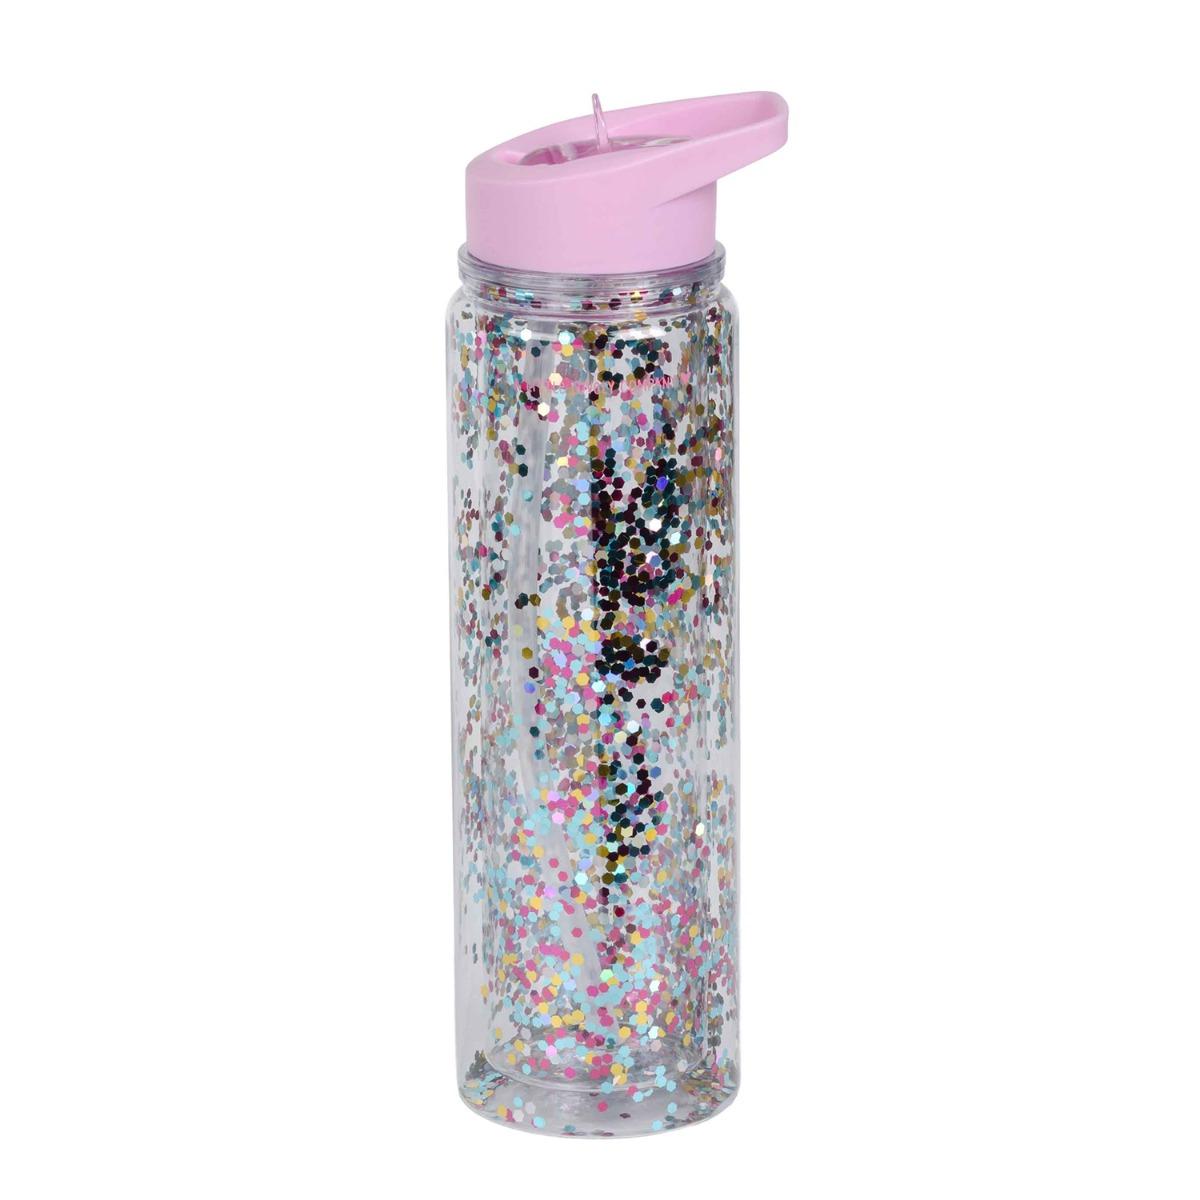 Drink bottle XL - Glitter - pink/multicolour